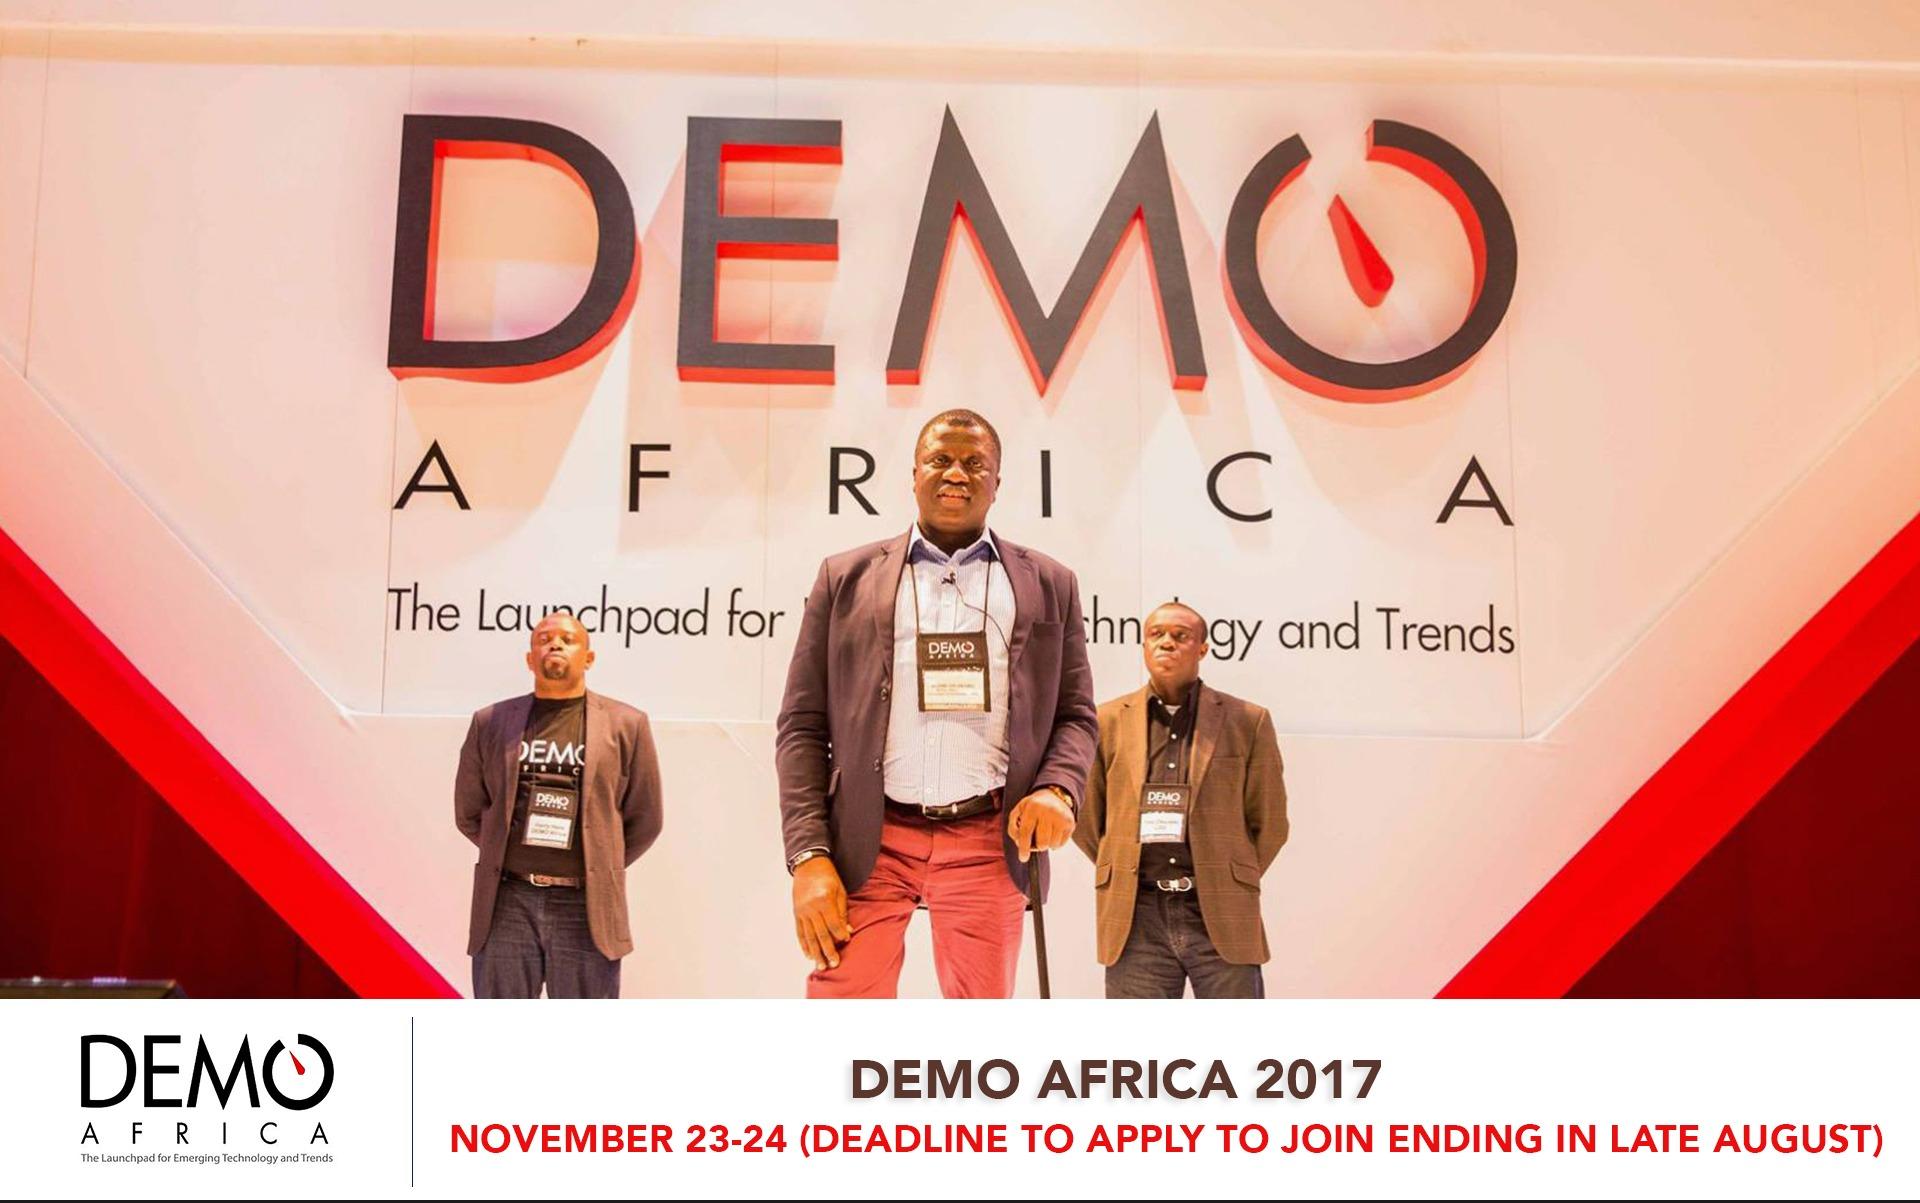 DEMO AFRICA 2017 - Techgistafrica